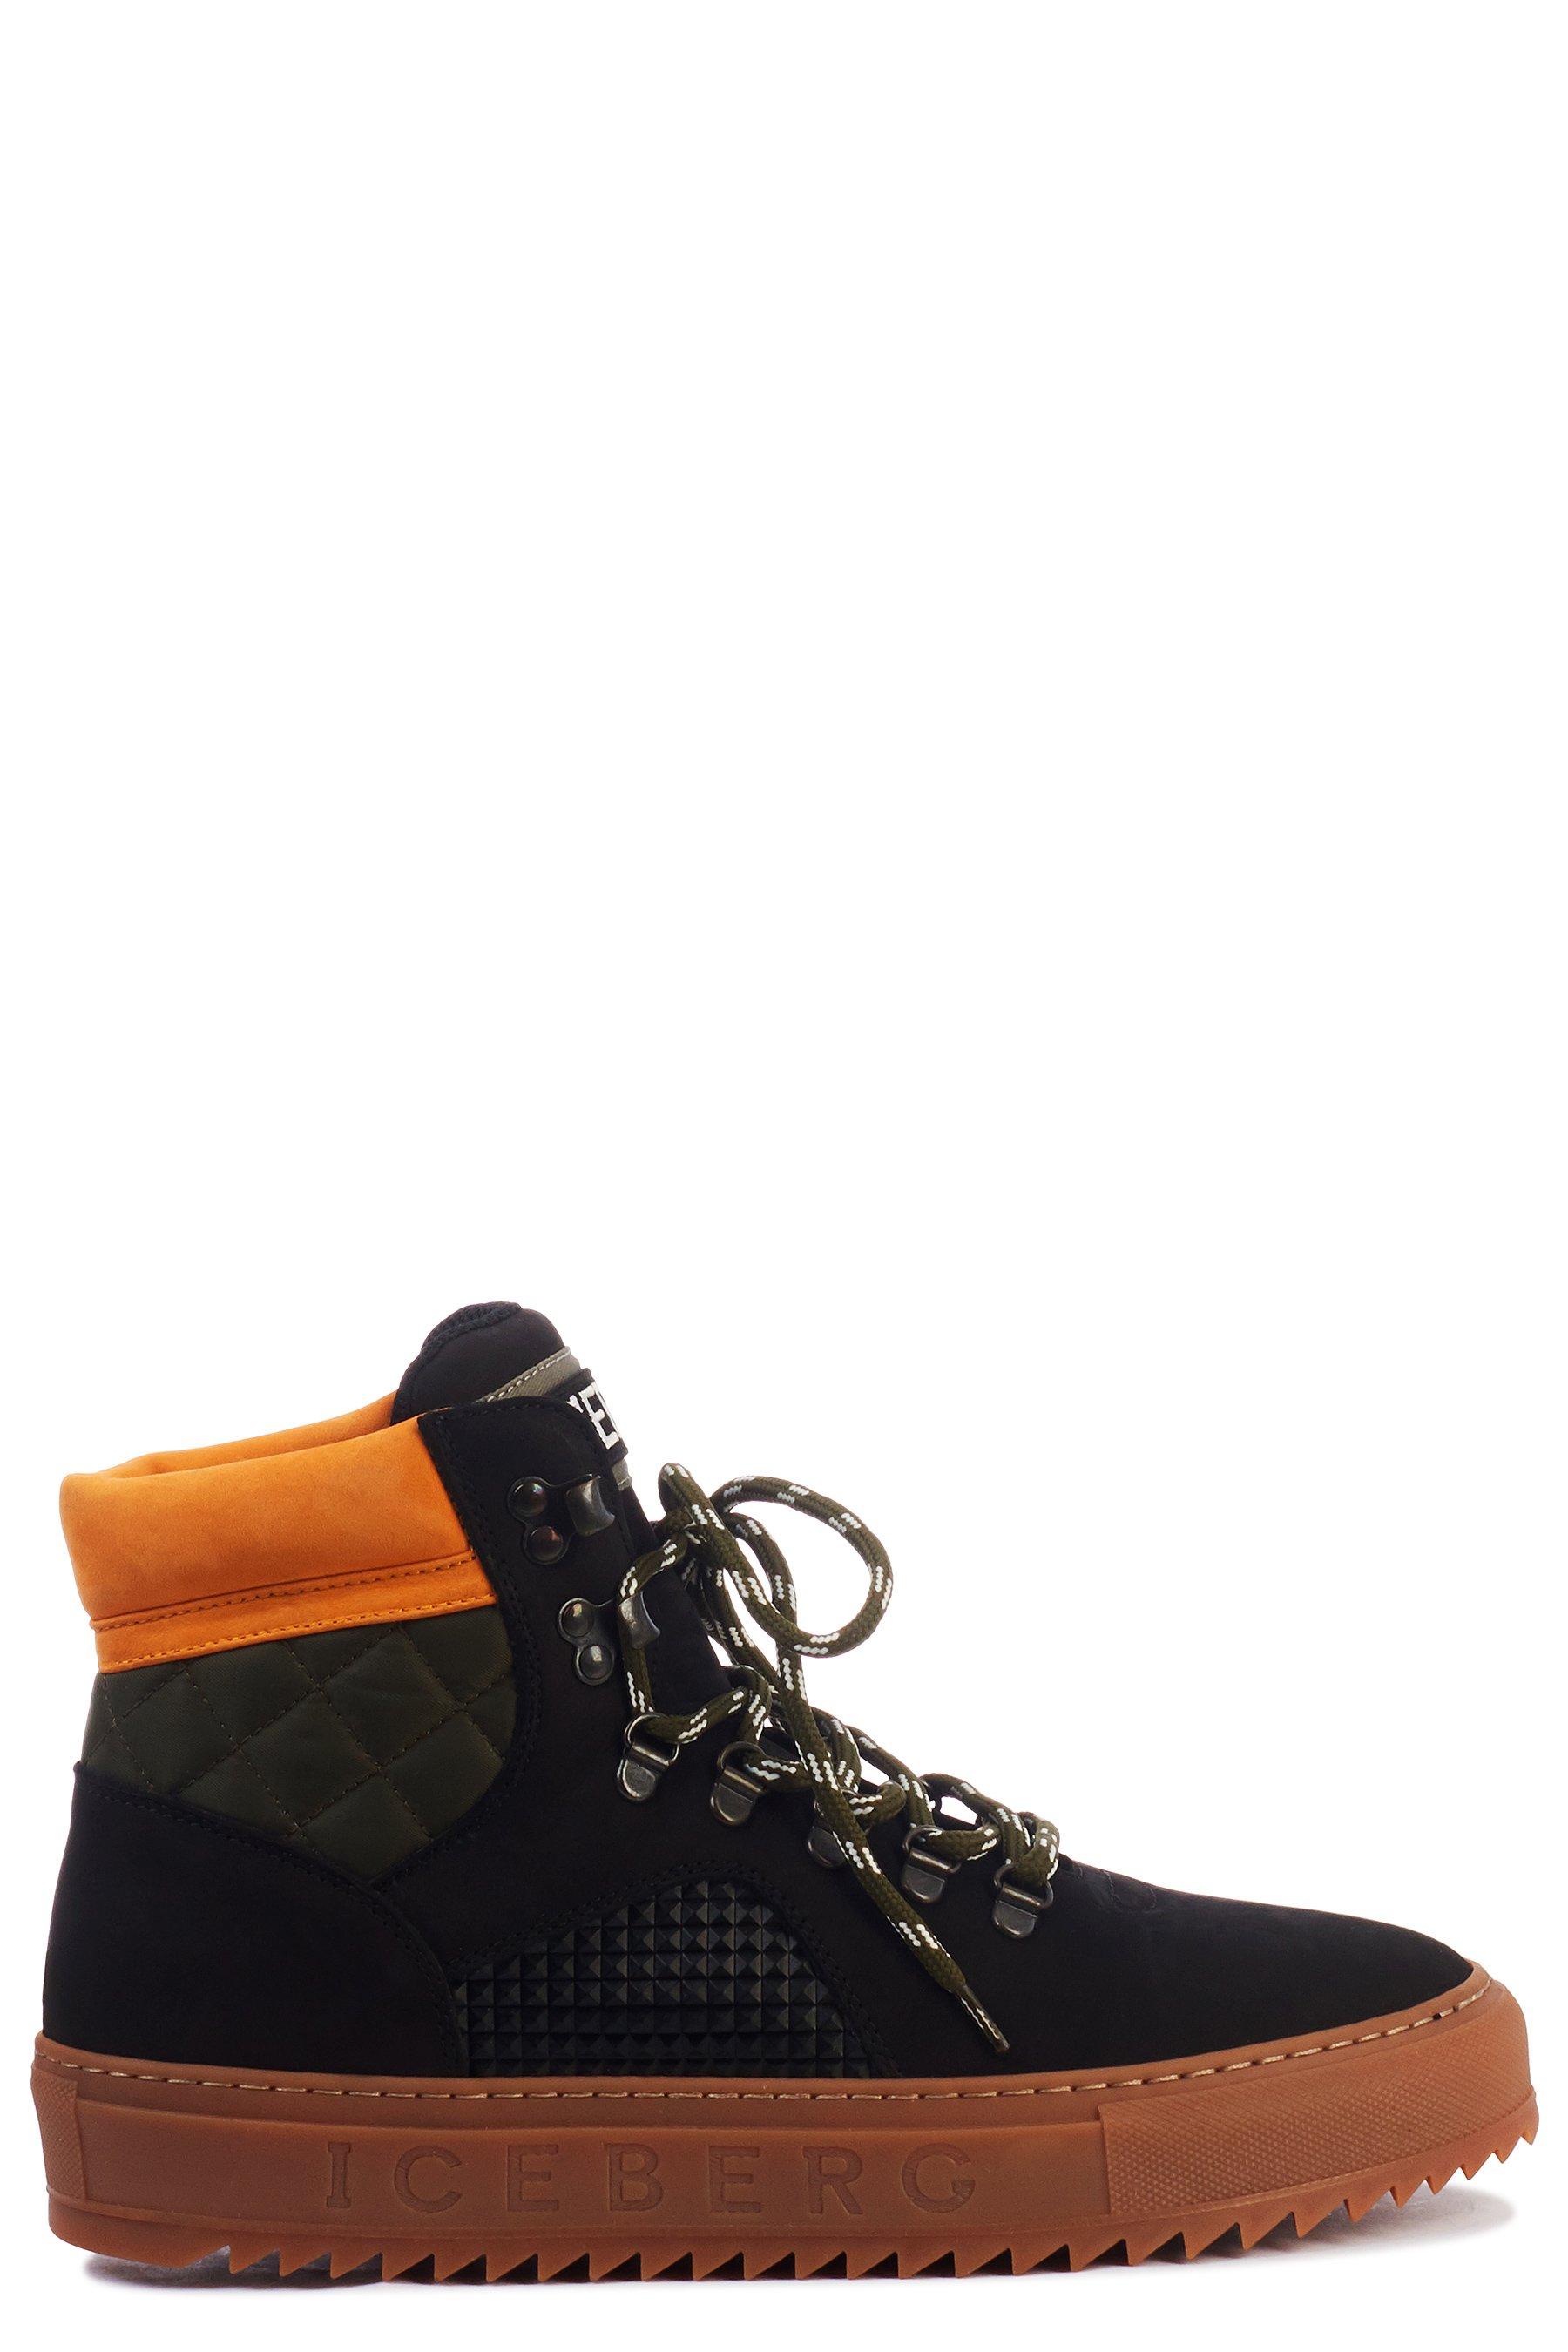 Iceberg schoenen